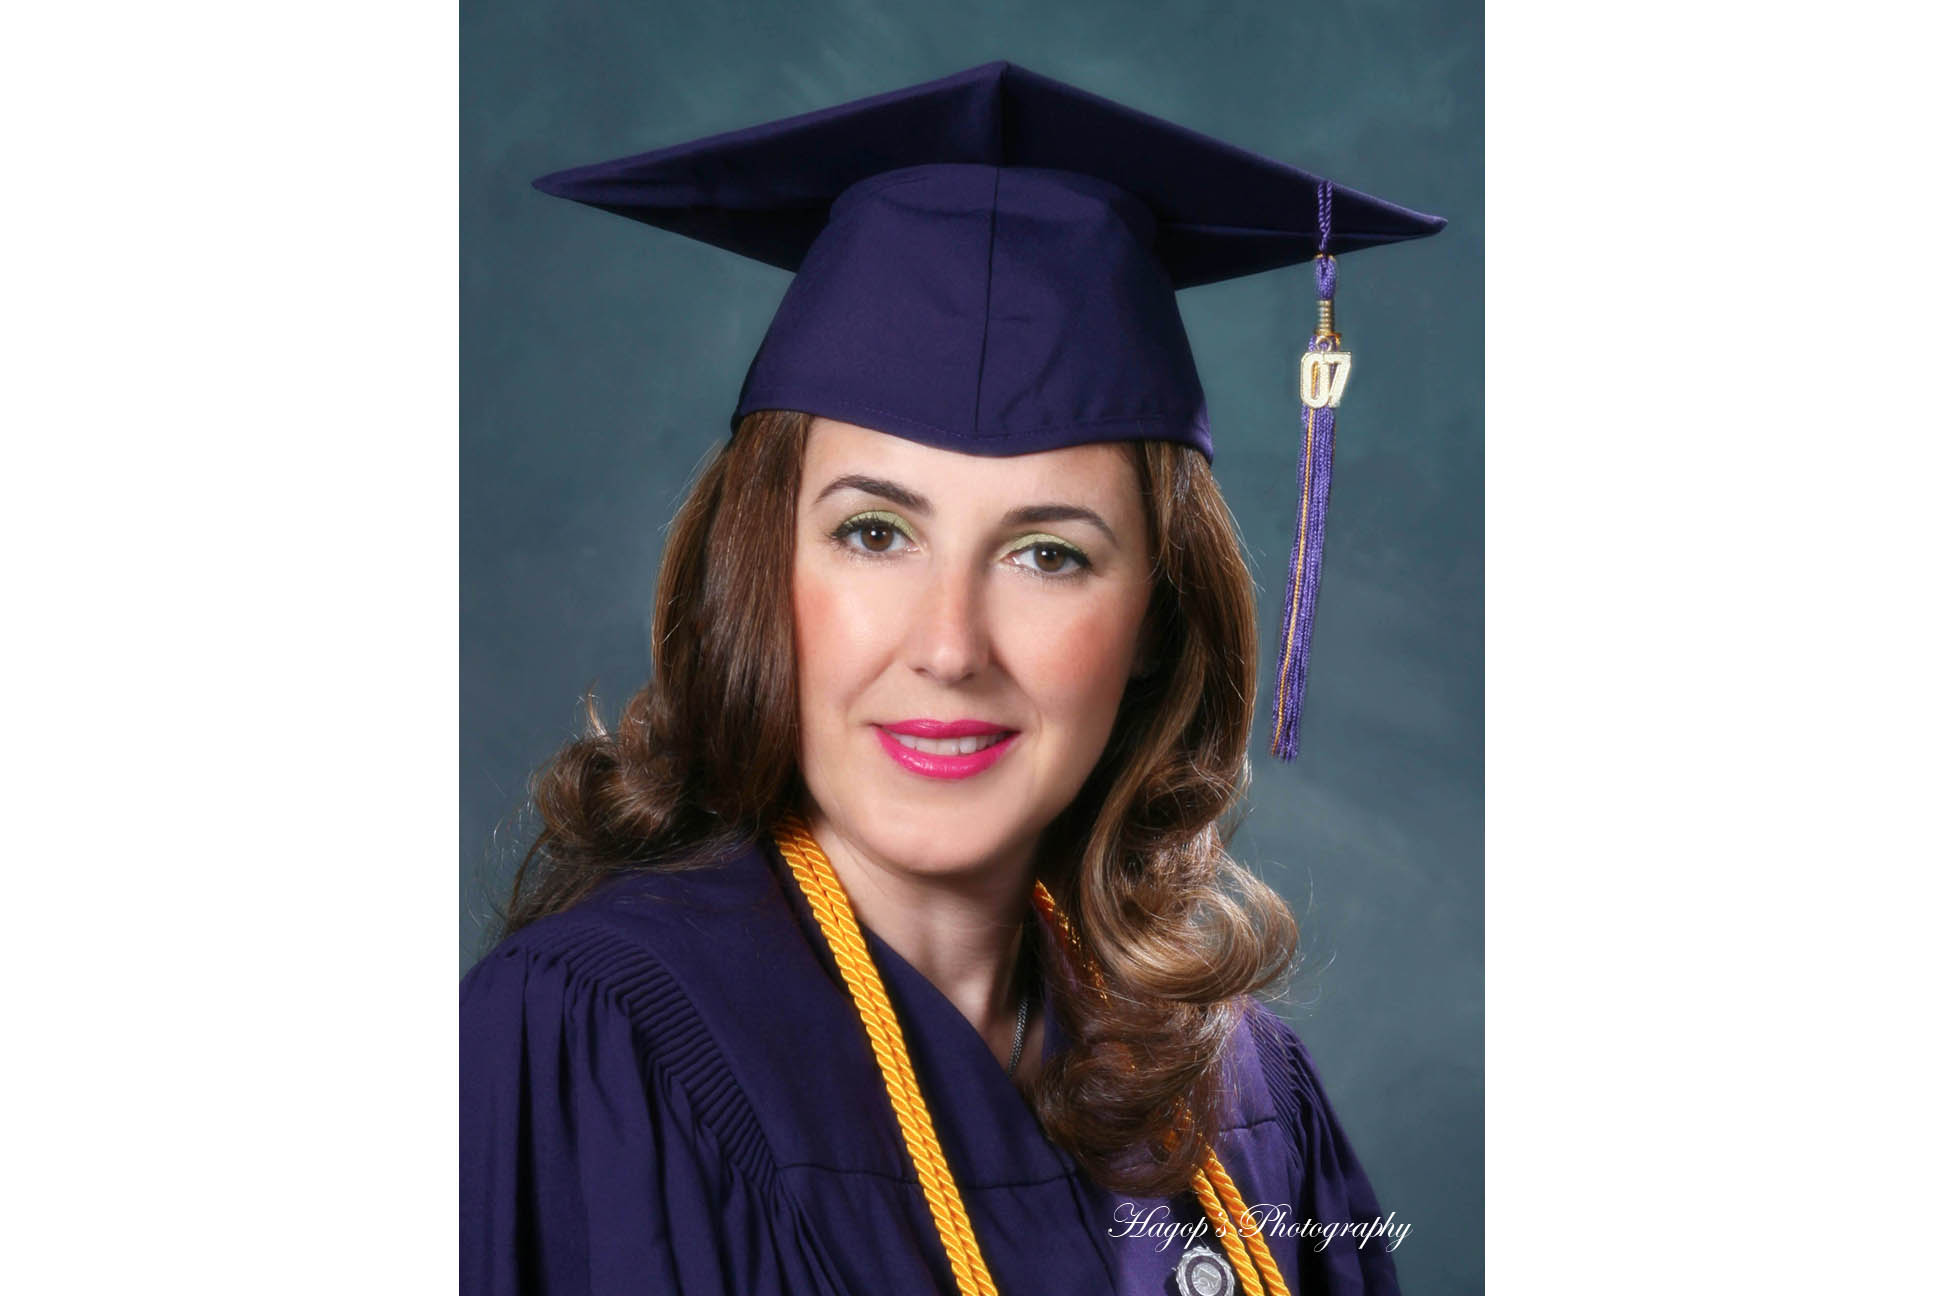 female cap and gown graduation headshot